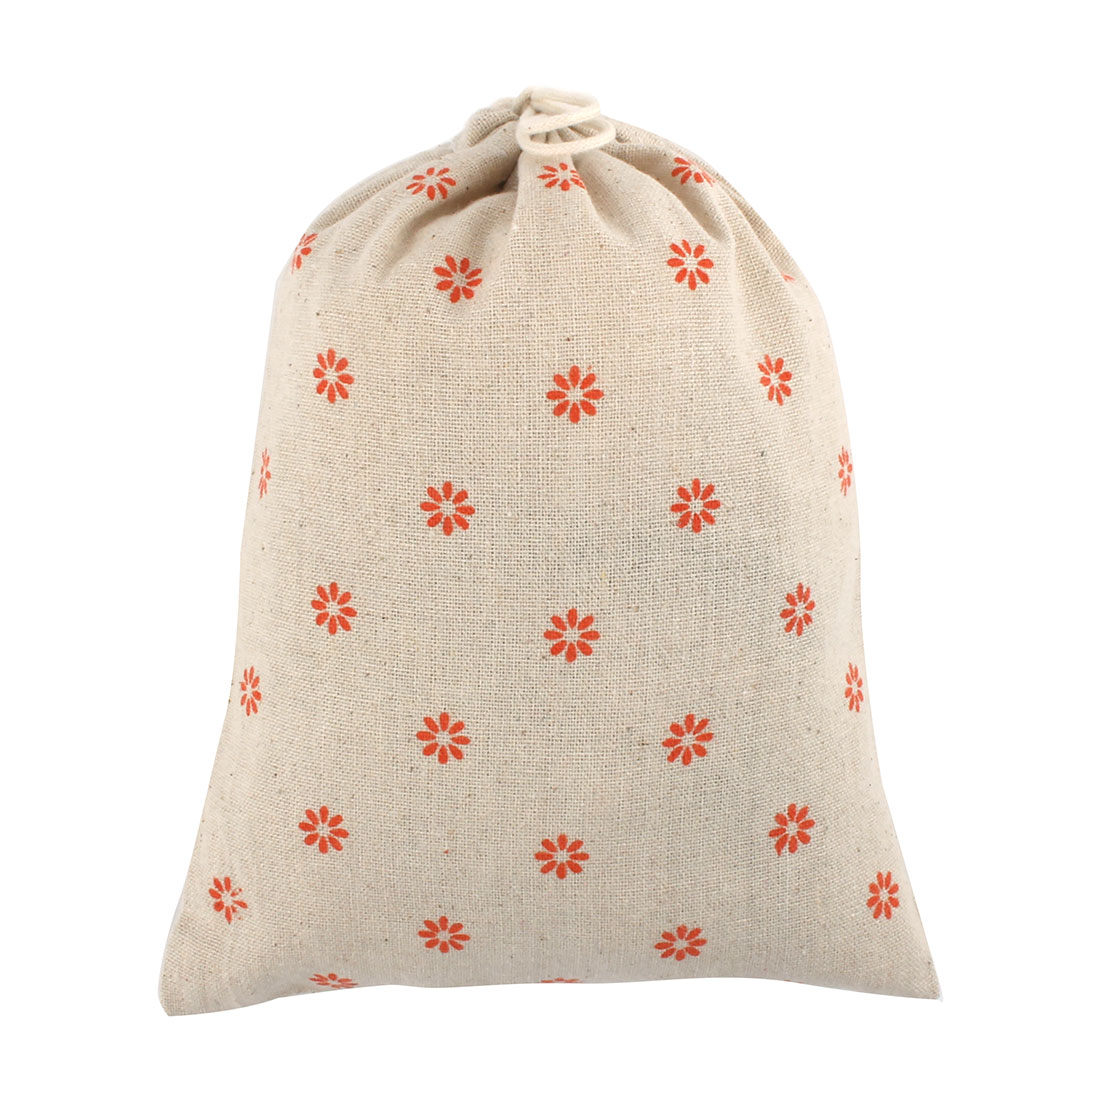 Travel Cotton Linen Sundries Storage Pouch Gift Package Drawstring Bag Medium